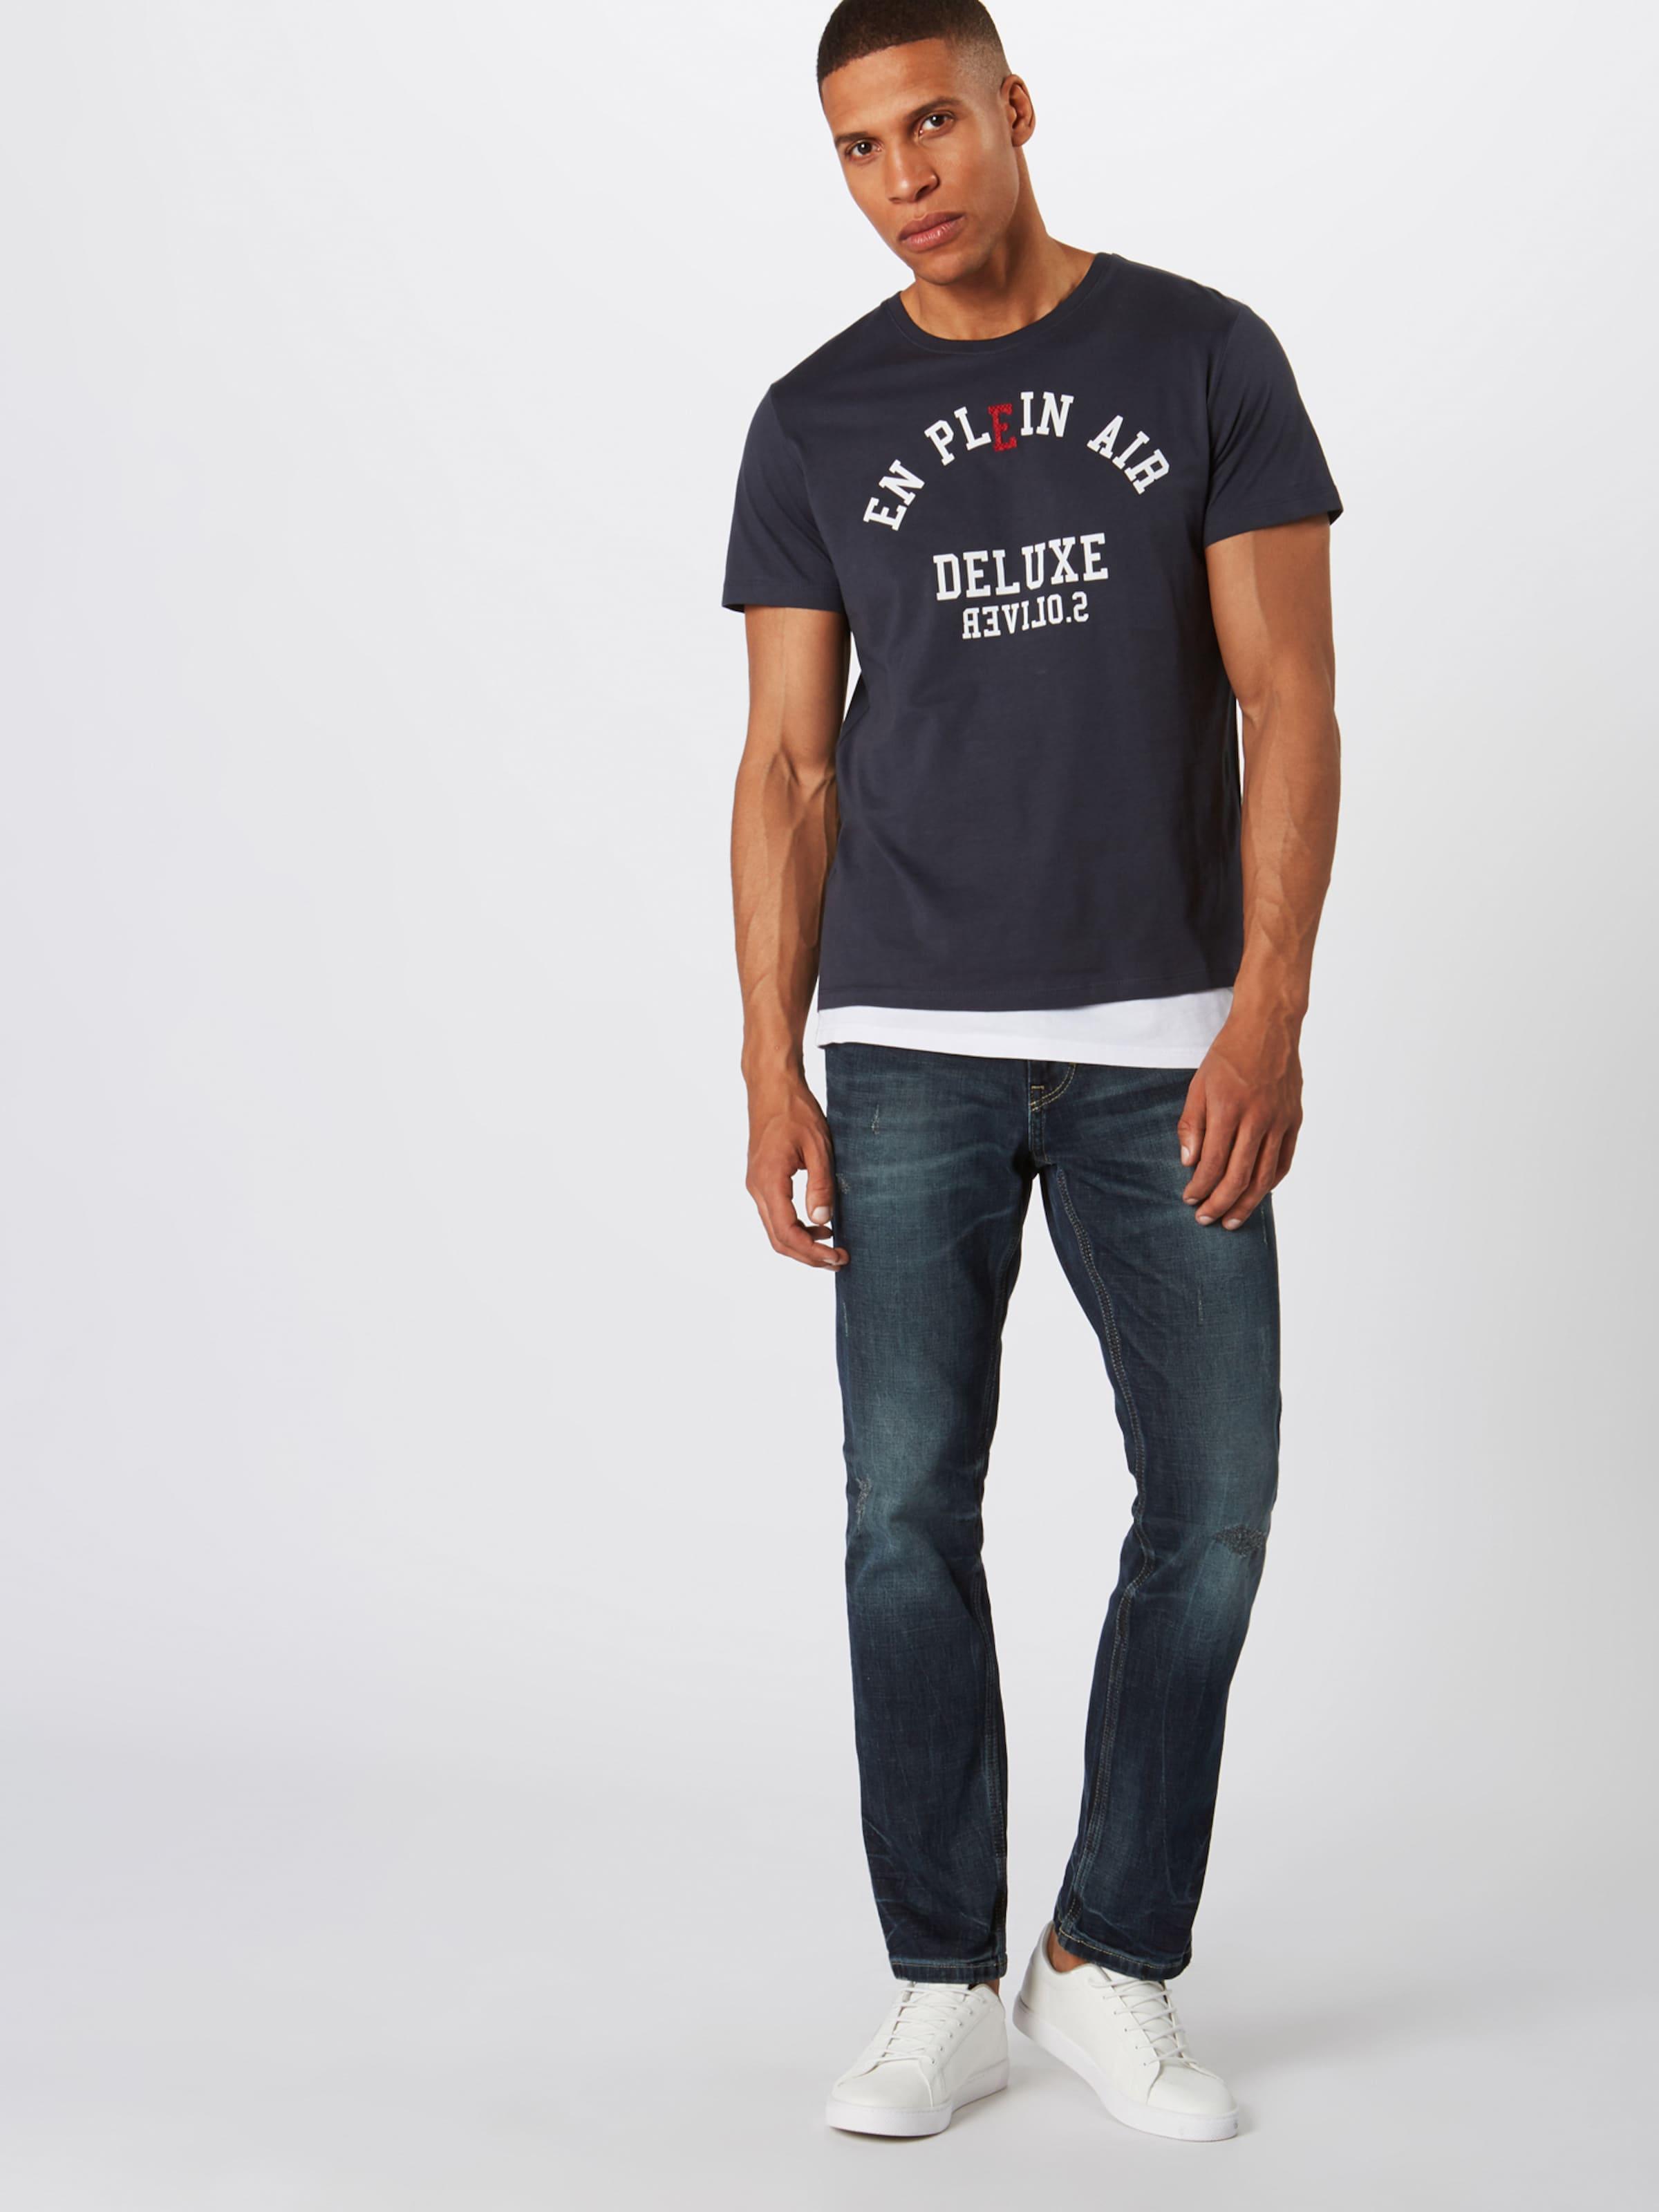 HerrenShirtsamp; 't shirt' S oliver Dunkelblau Red Label Polos In 54RjLA